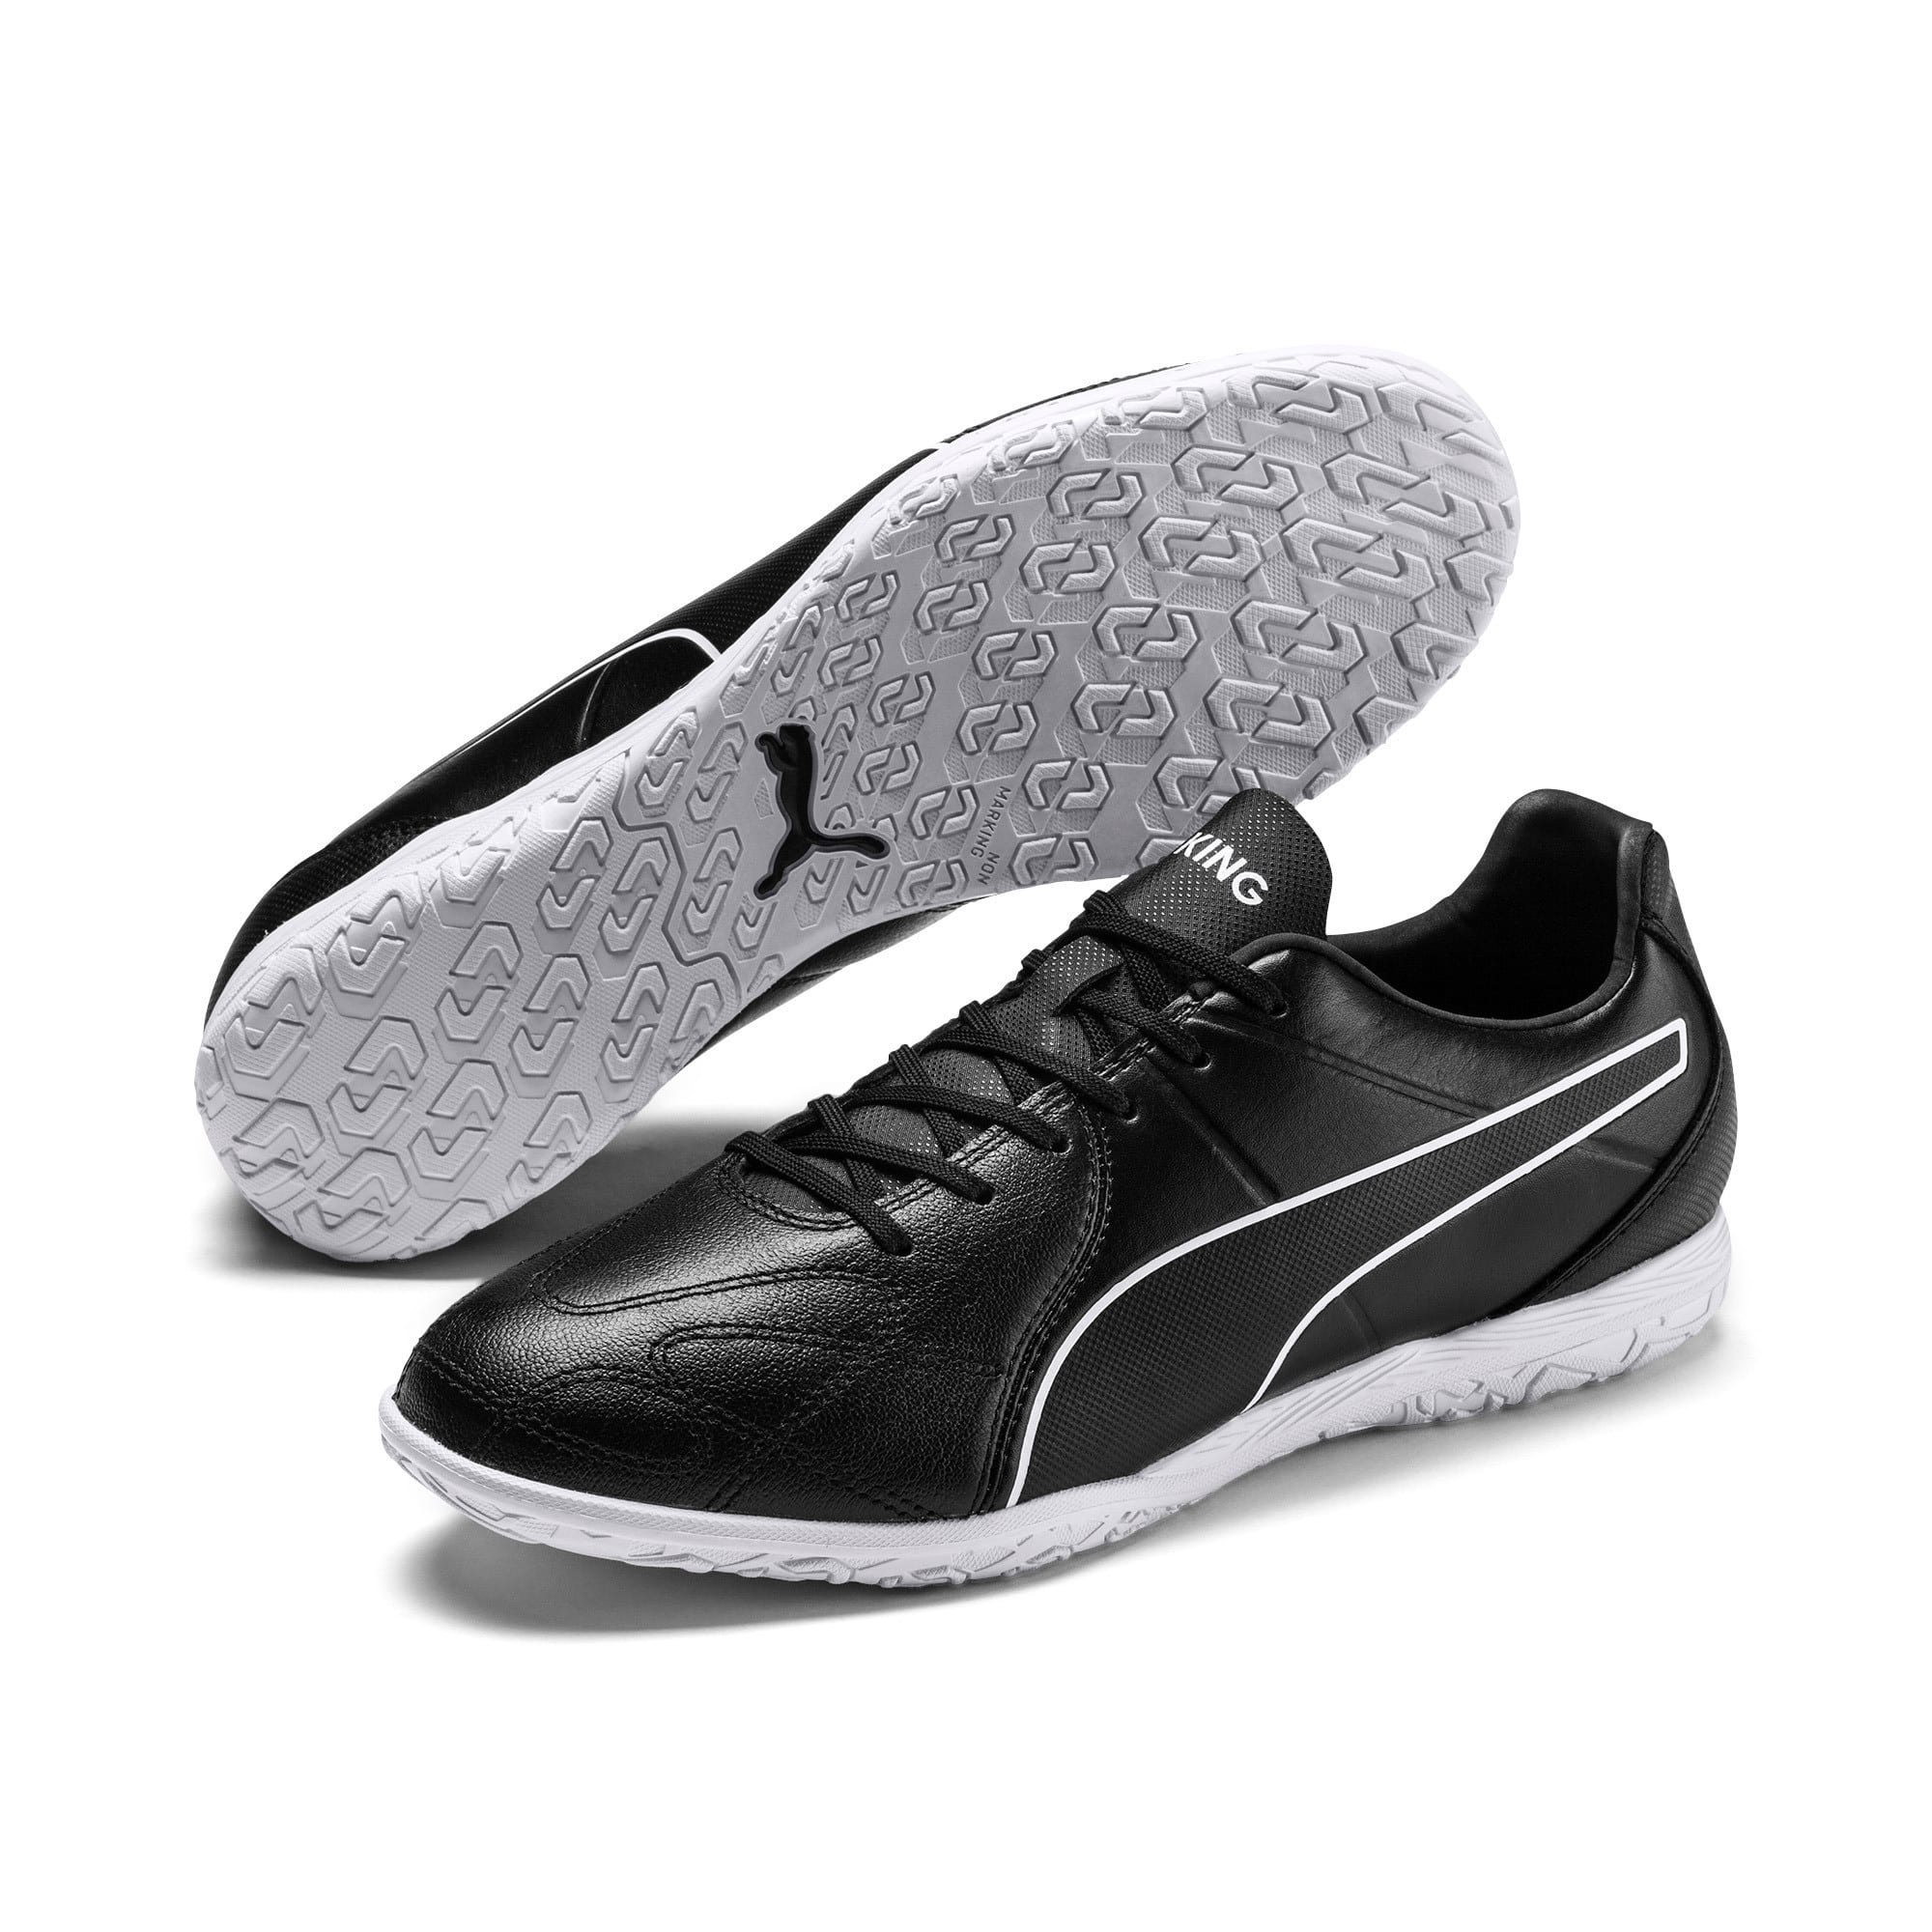 Thumbnail 4 of KING Hero IT Football Boots, Puma Black-Puma White, medium-IND